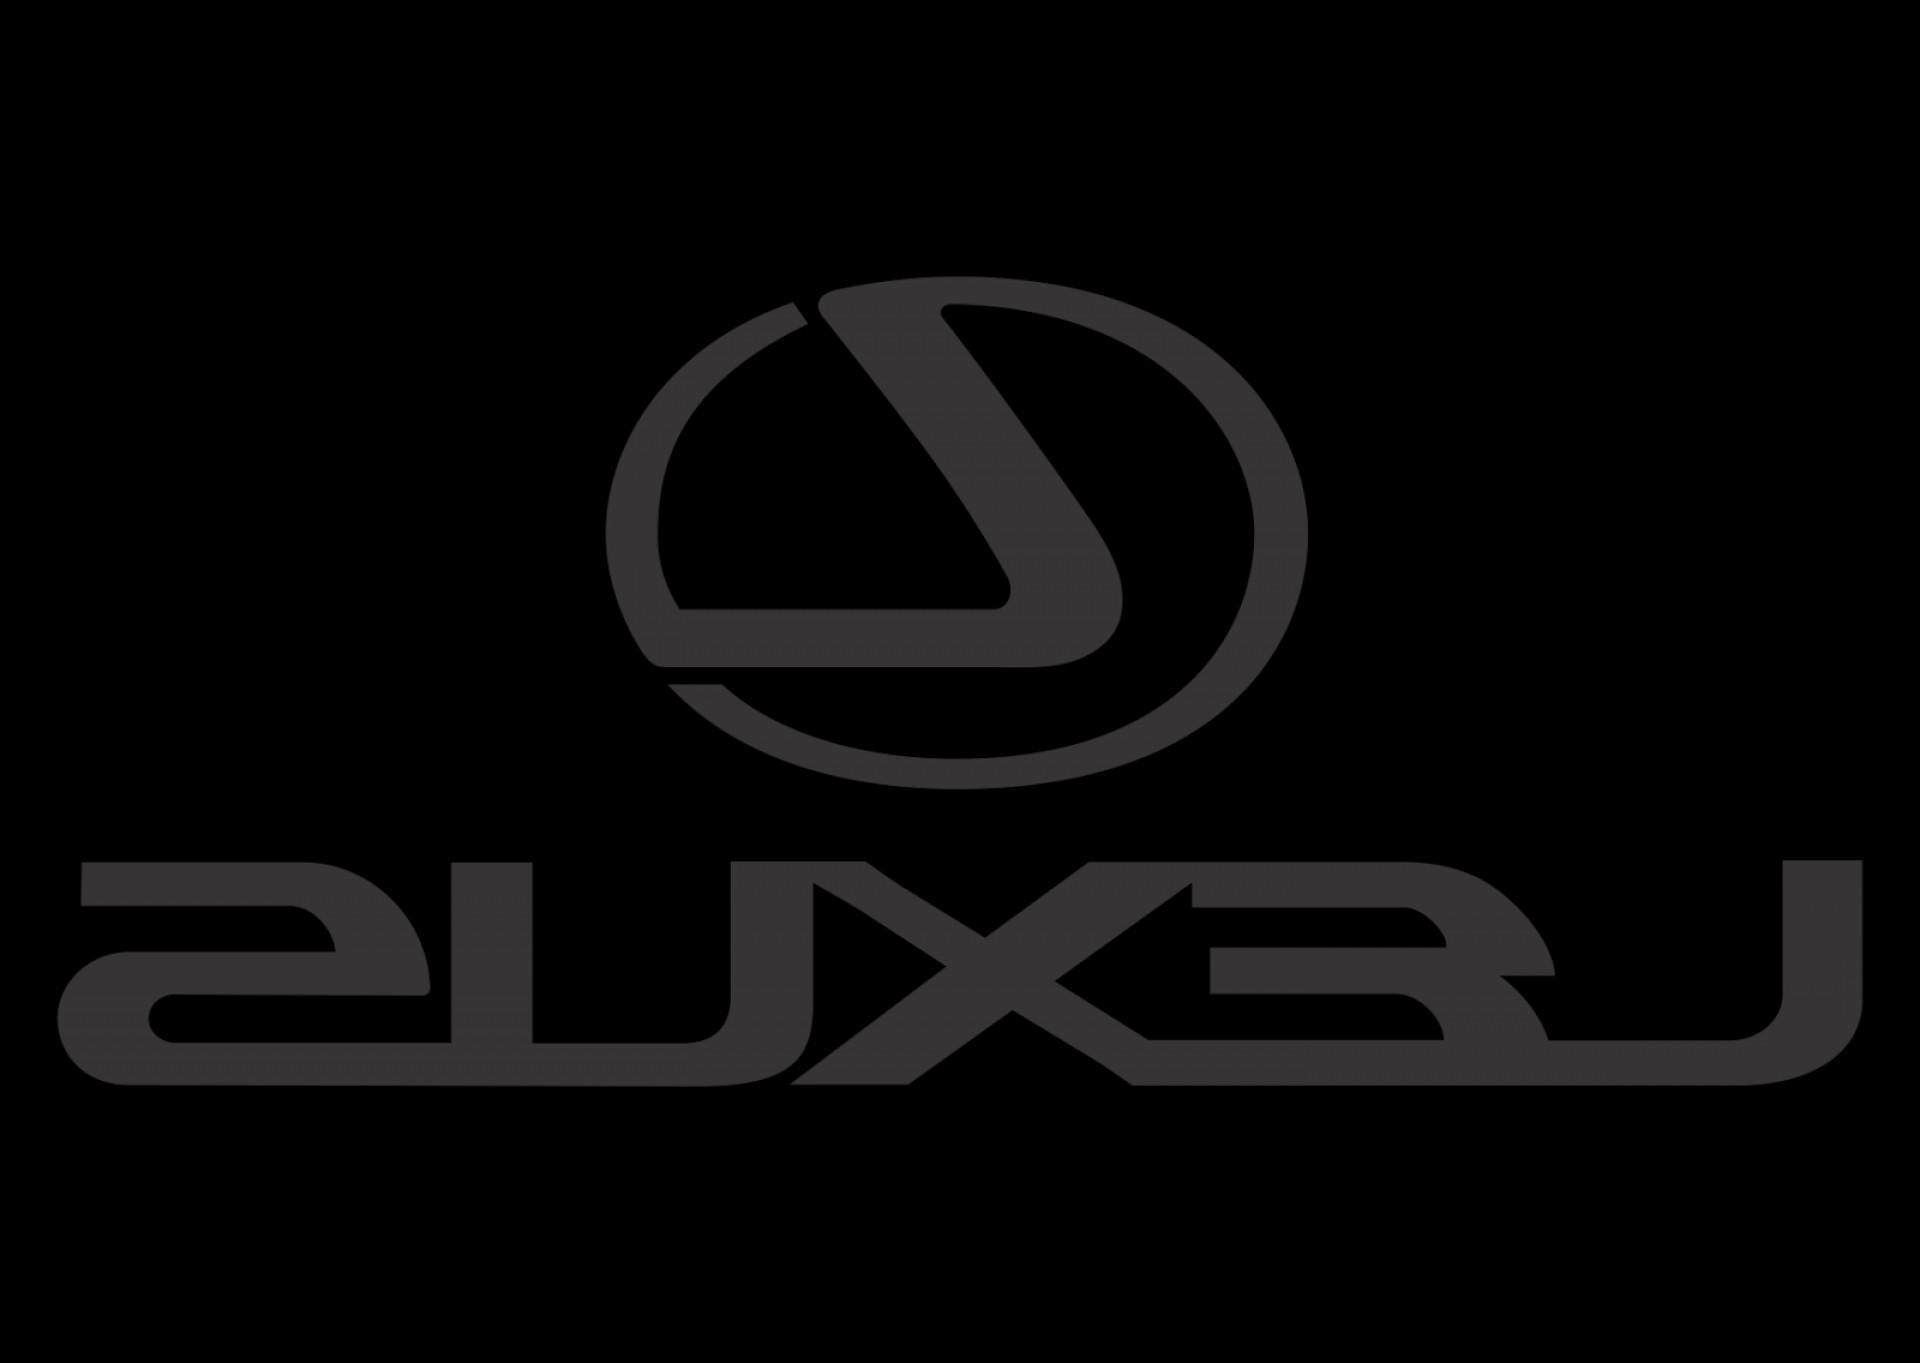 1920x1363 Lexus Auto Logo Vector Png Arenawp